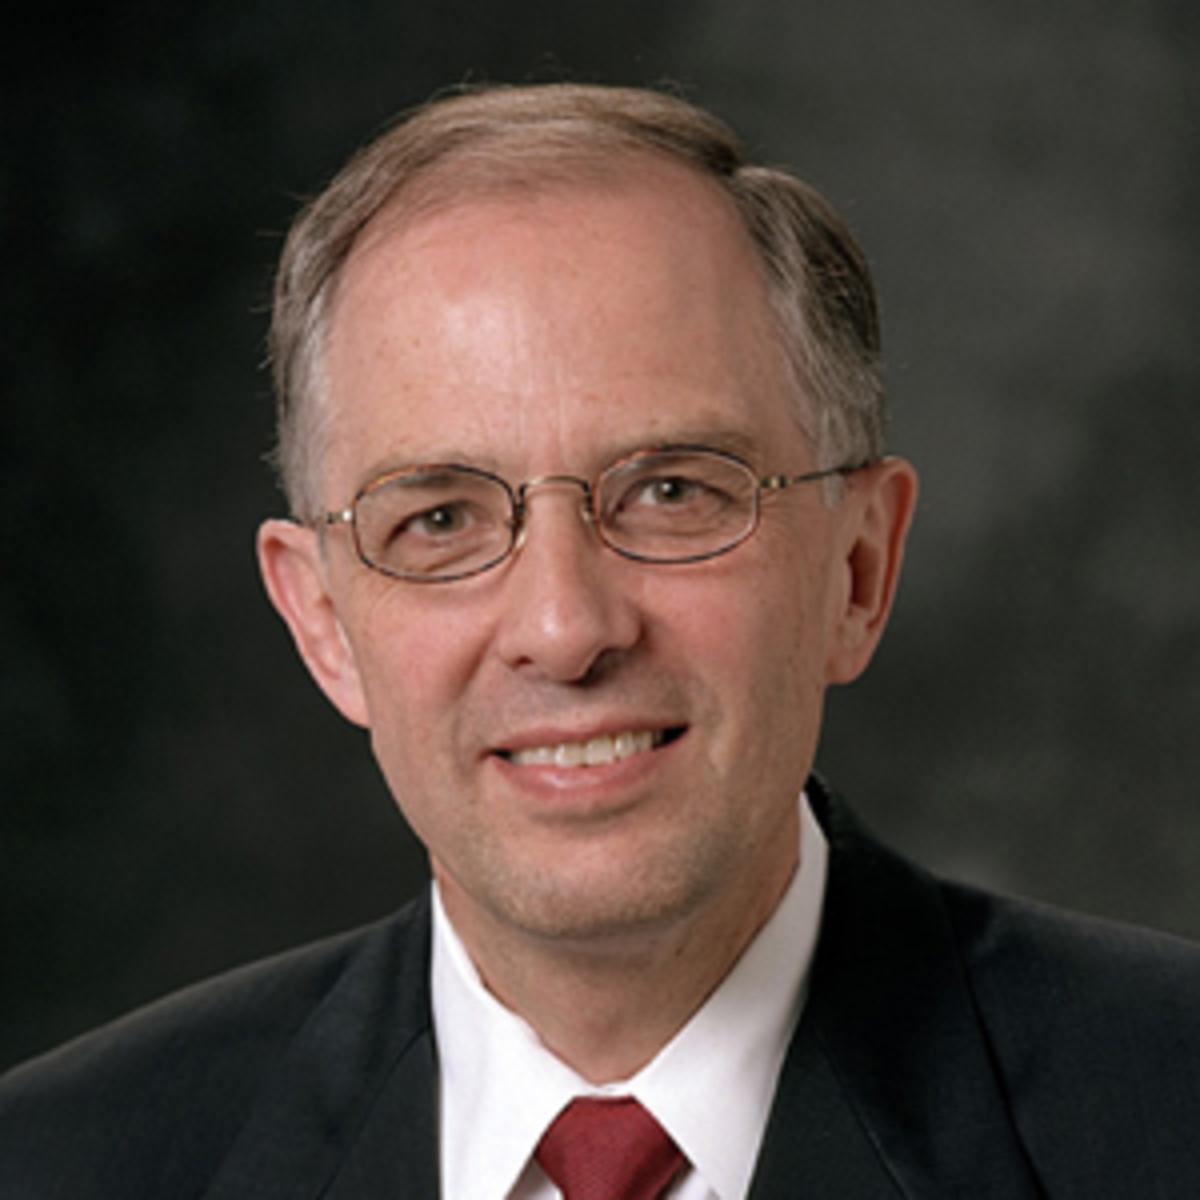 Elder Neil A. Andersen